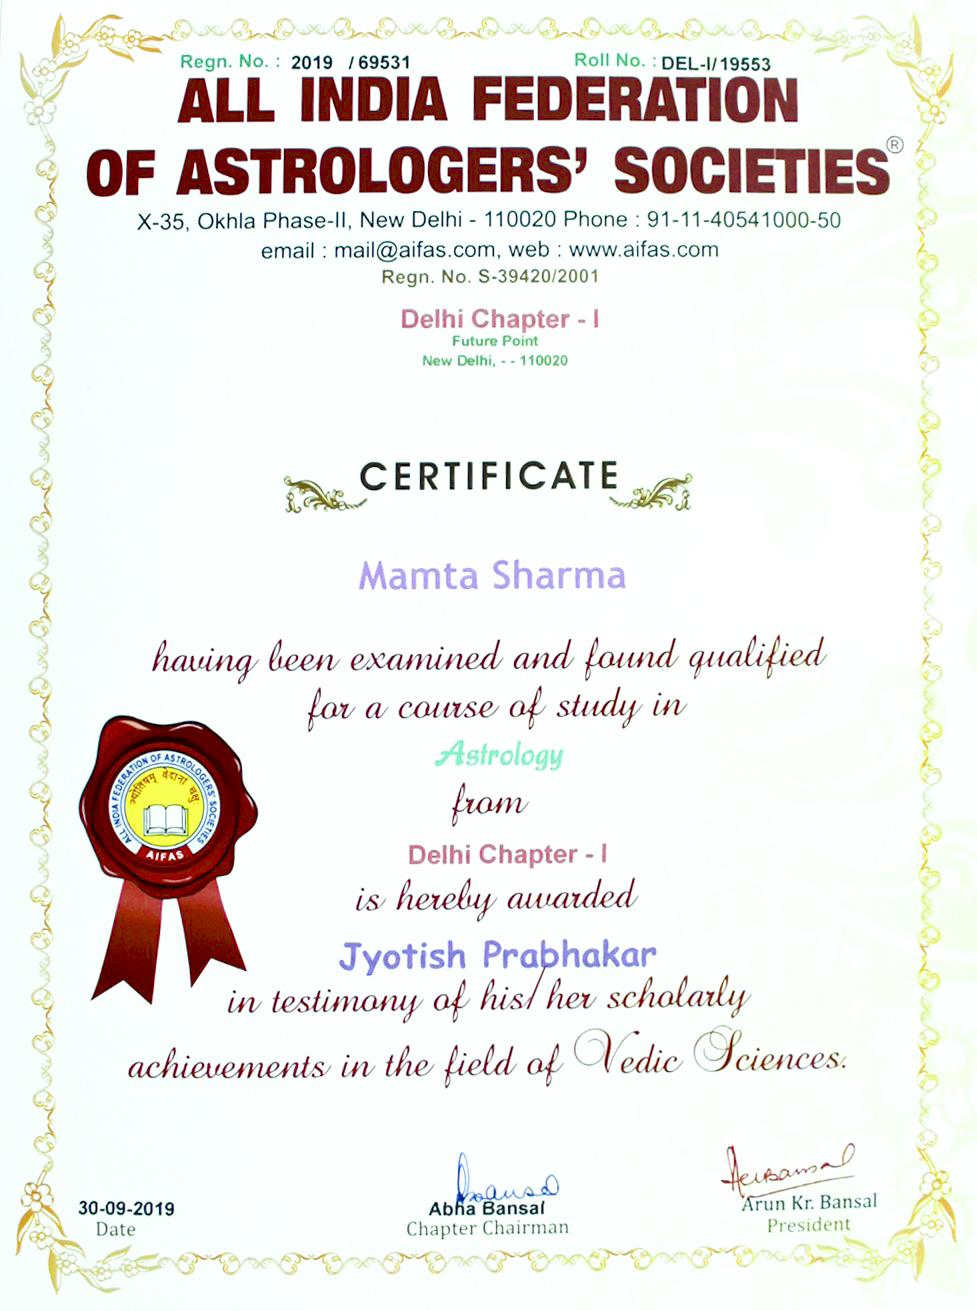 Astrology Jyotish Prabhakar Certificate Dr Mamta Sharma